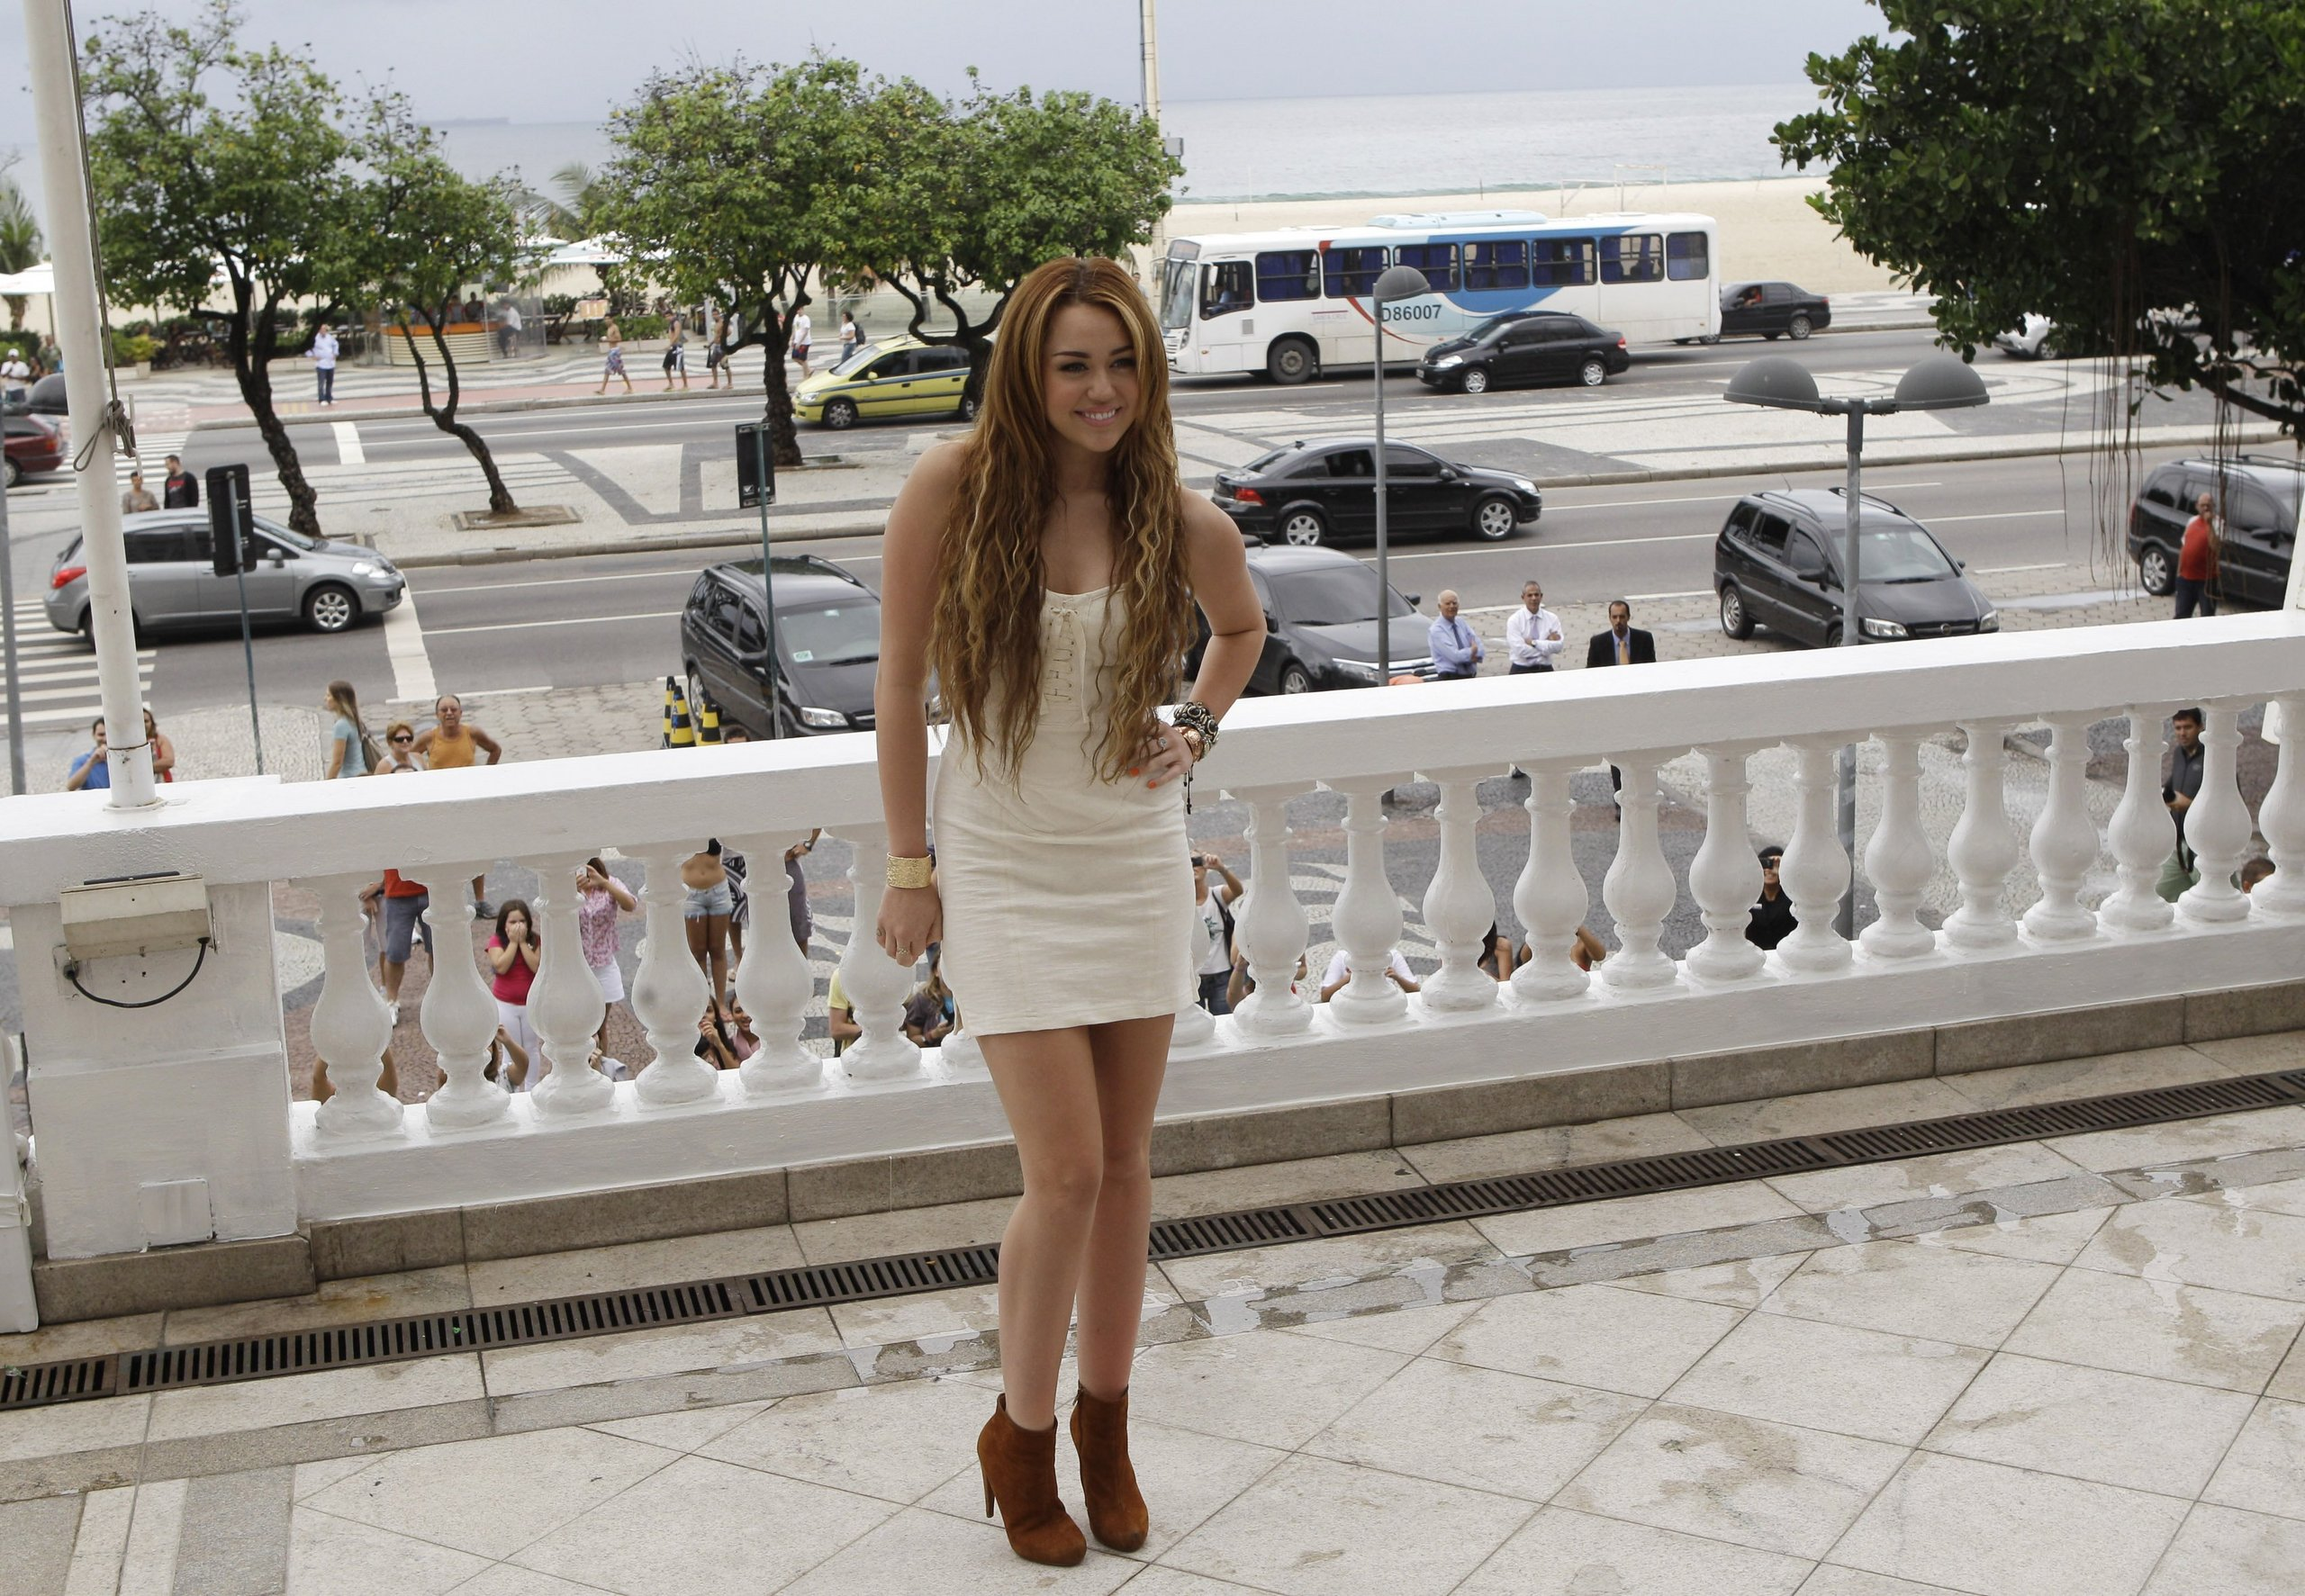 13. May - At the Copacabana Palace Hotel in Rio de Janeiro